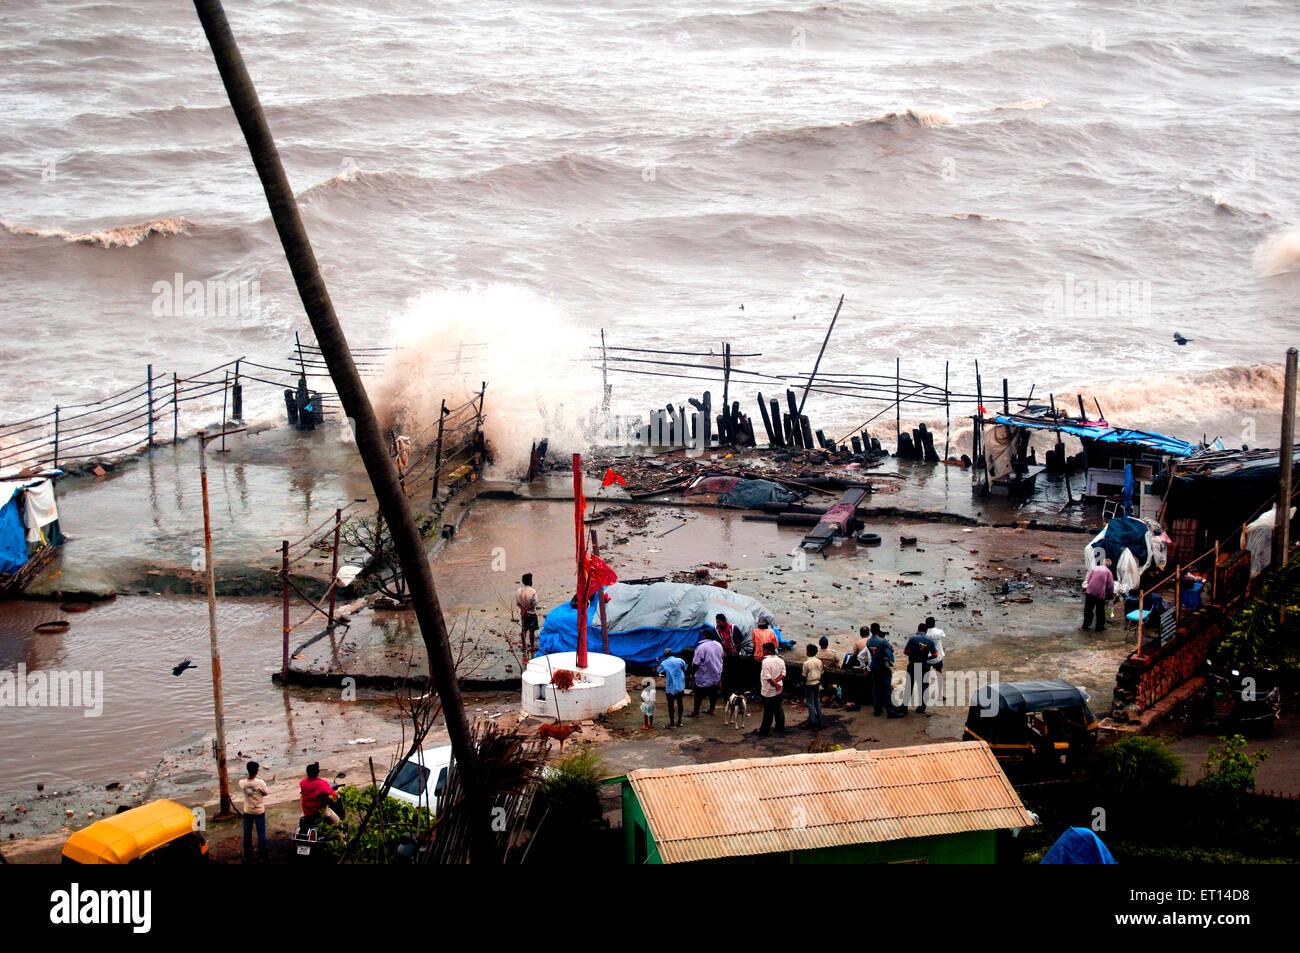 High tide destruction mumbai India - Stock Image